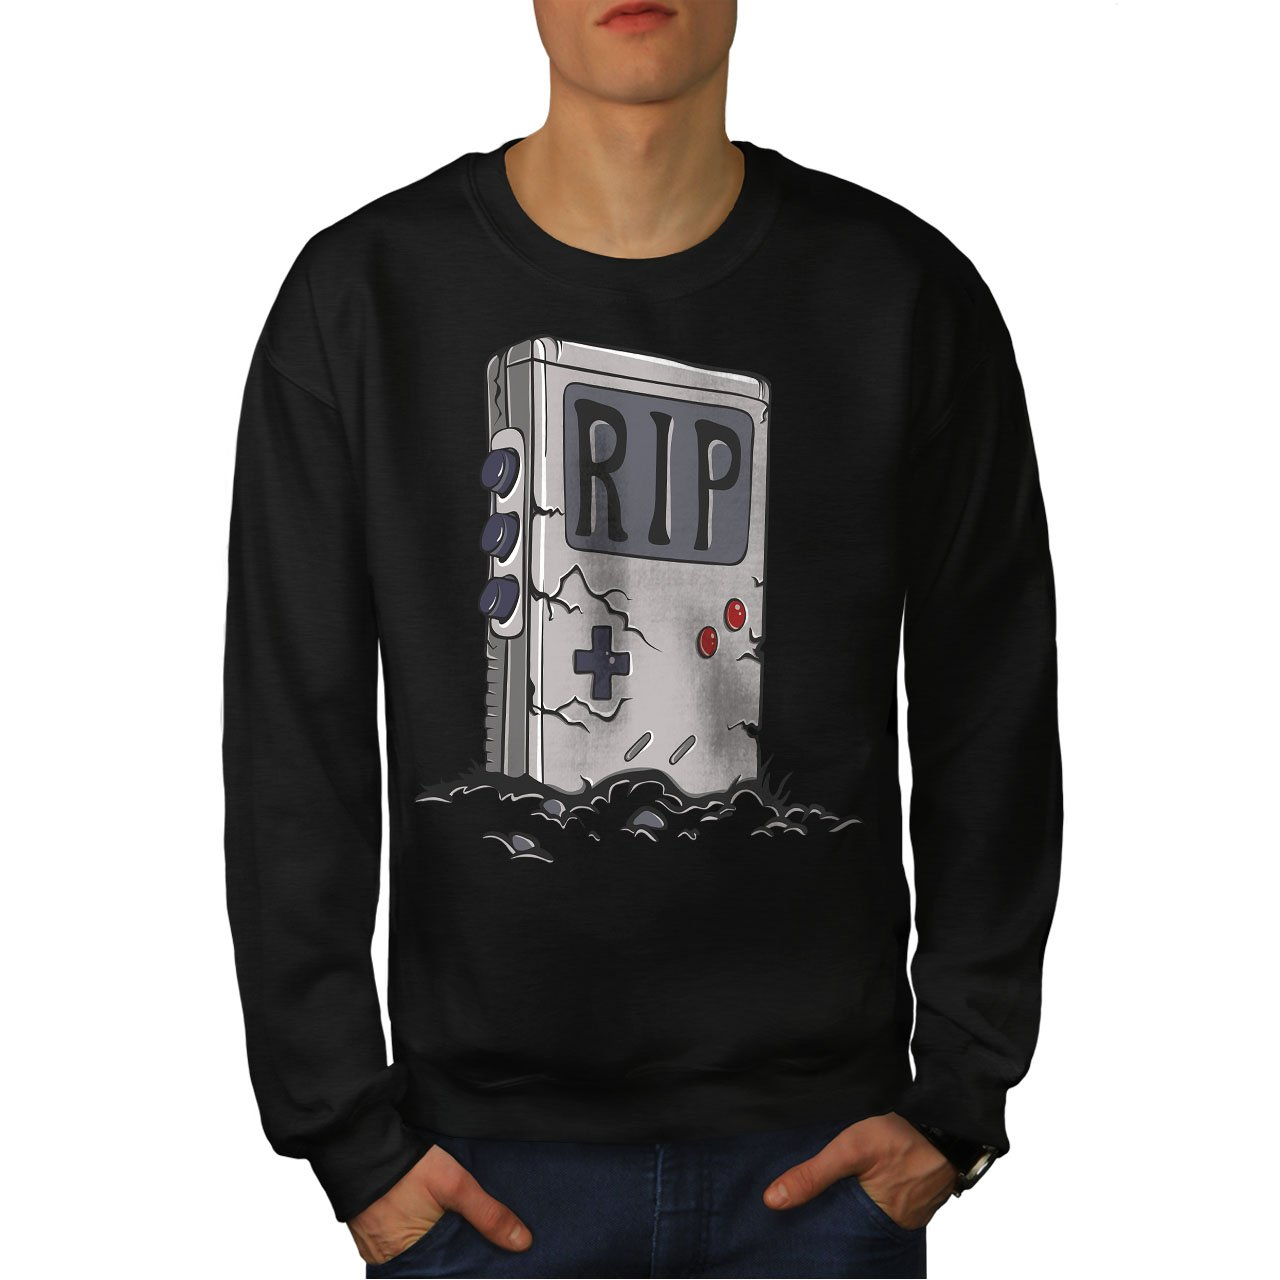 Live 90s Gaming Casual Jumper wellcoda Old Gameboy Mens Sweatshirt